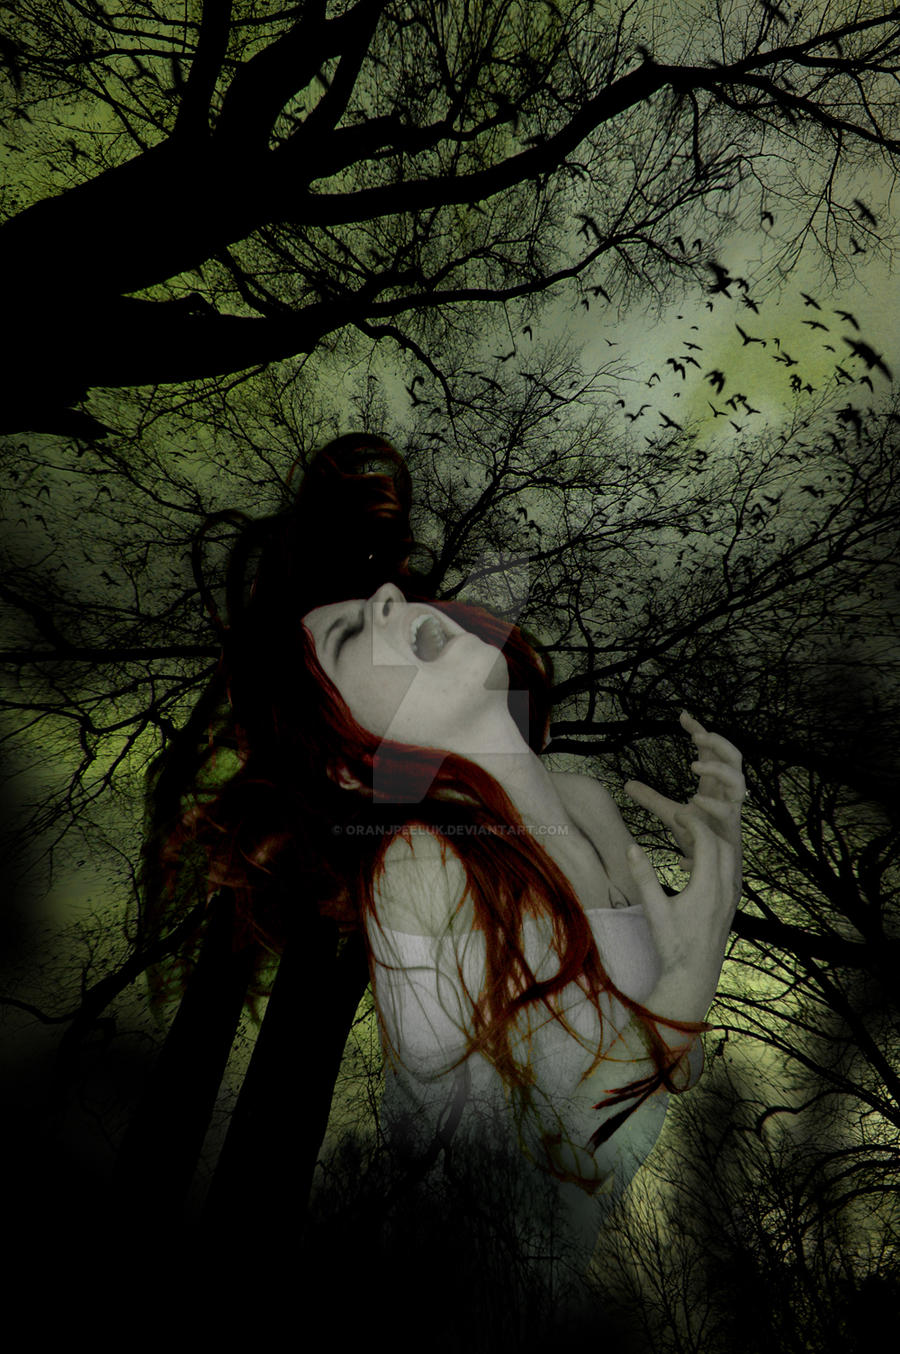 Soul Scream by oranjpeeluk